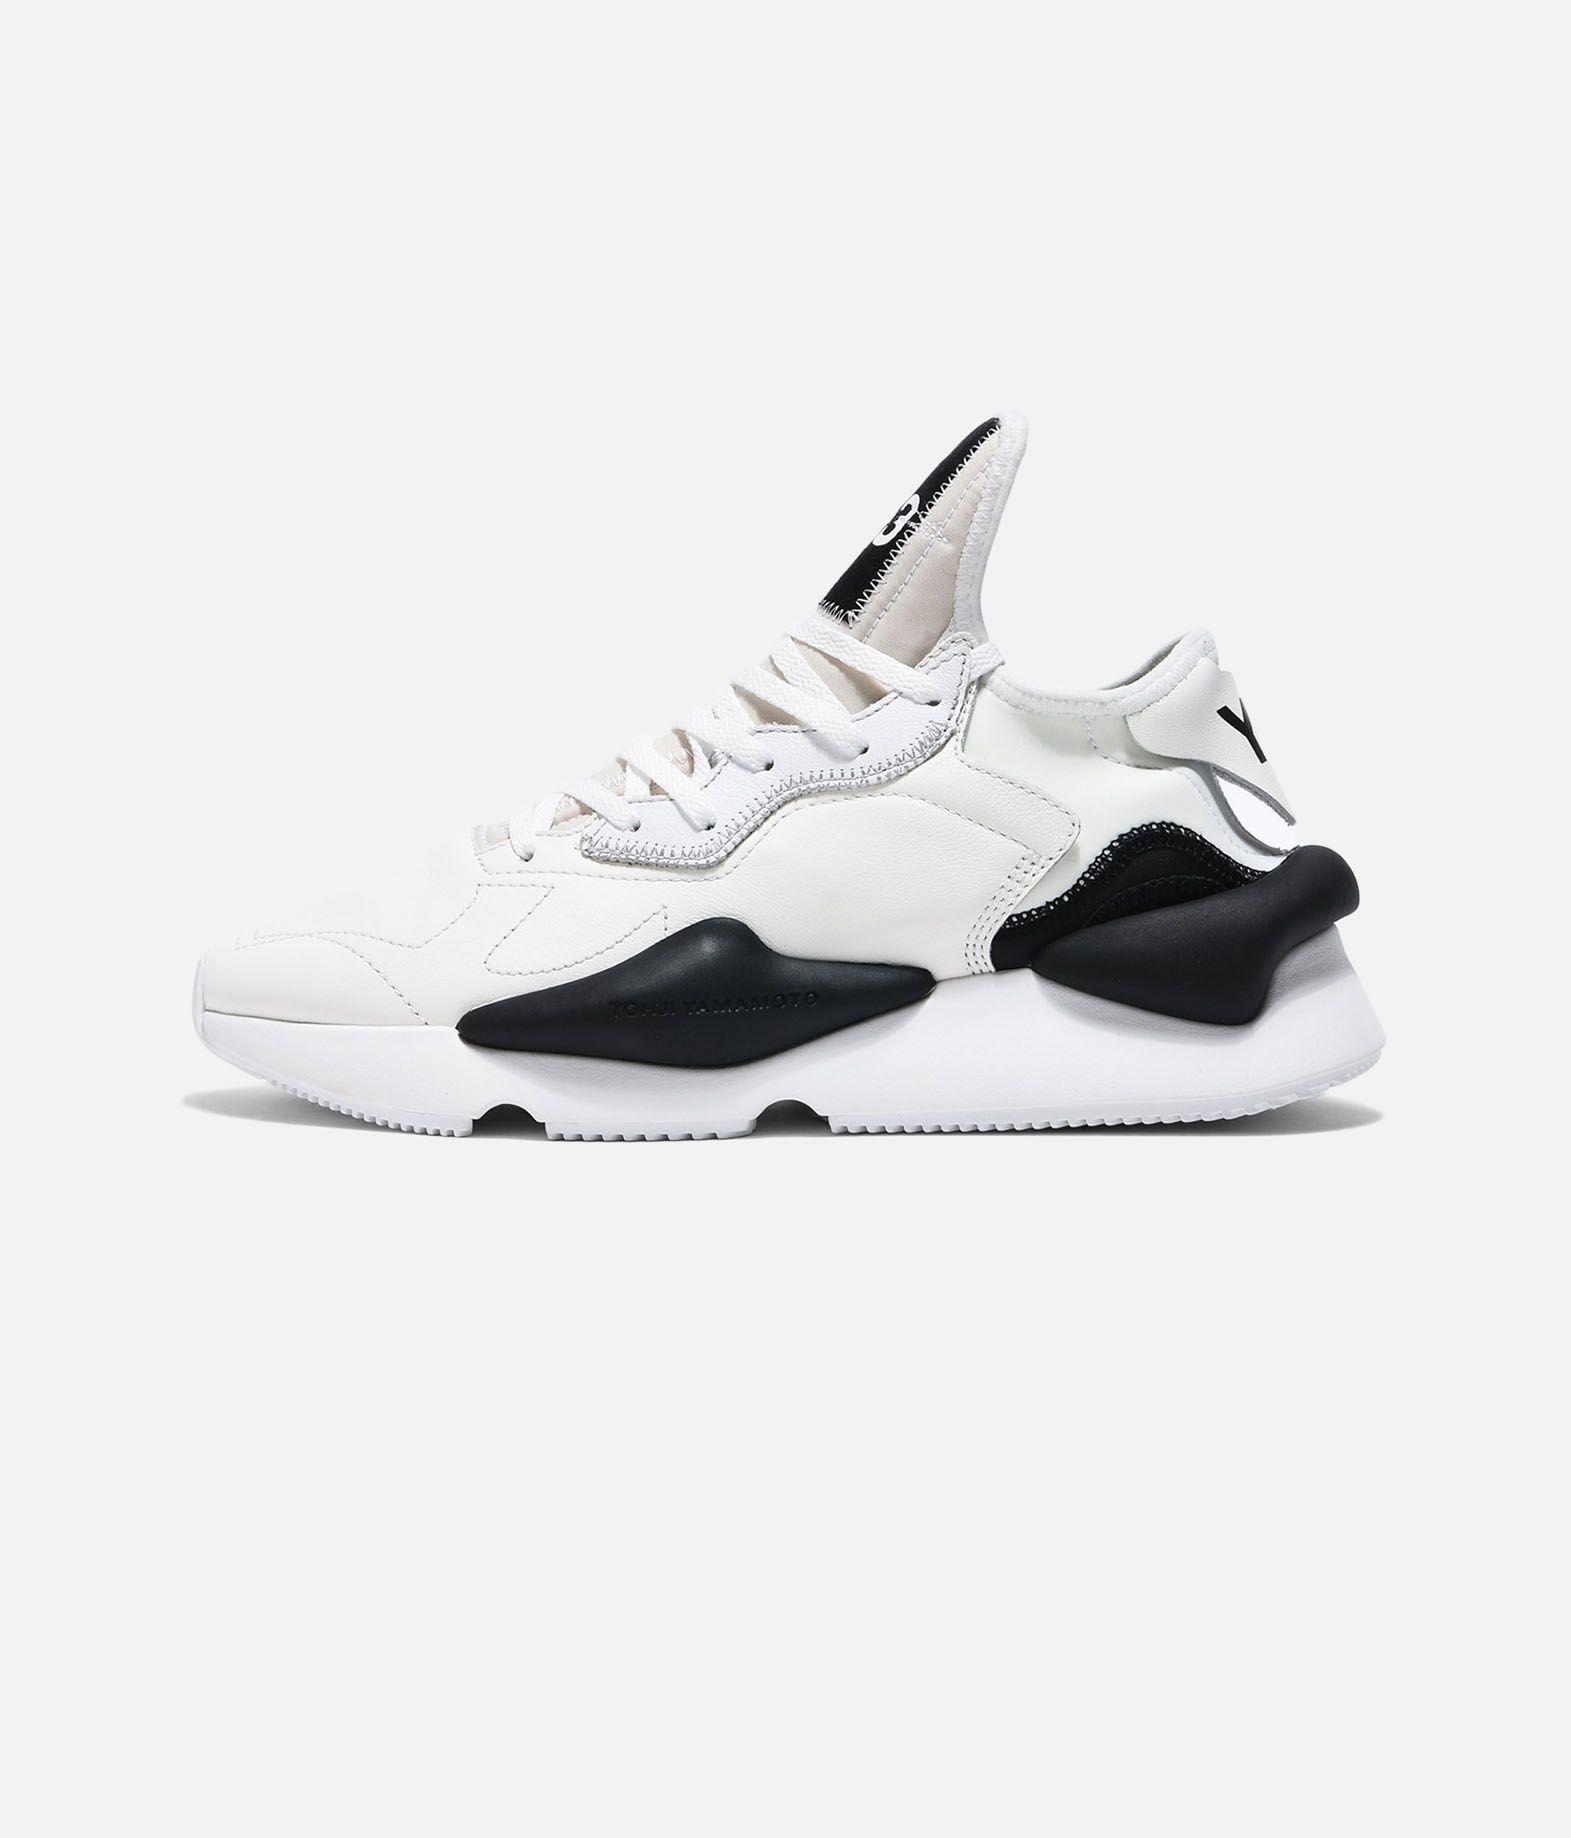 4c24589398b9a ... Y-3 Y-3 Kaiwa Sneakers E f ...